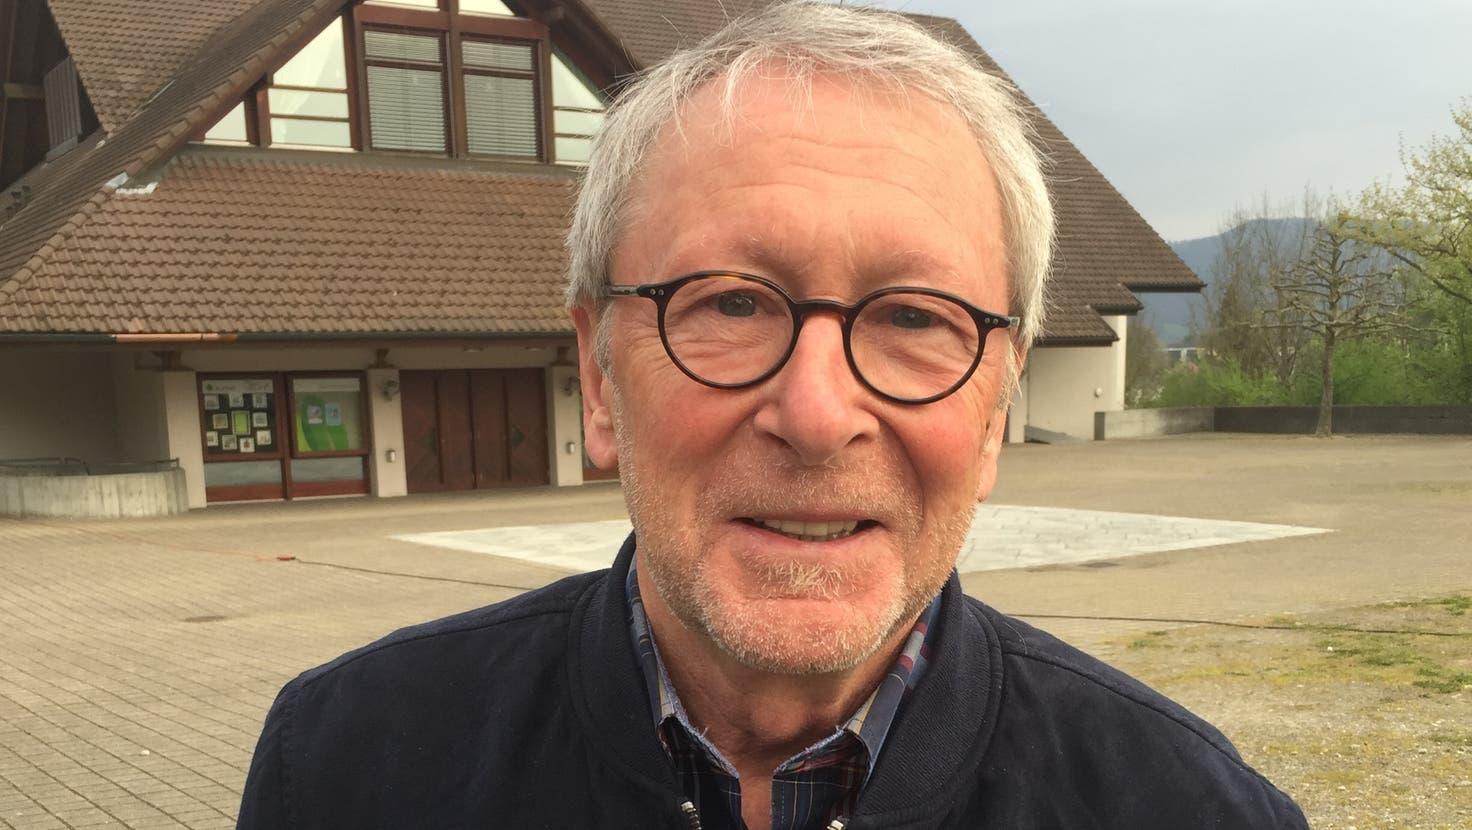 «Hetzkampagne gegen das 3-G-Zertifikat»: Wolfgang Schibler ärgert sich über Kantonalparteipräsident und Nationalrat Andreas Glarner (Urs Helbling / AAR)